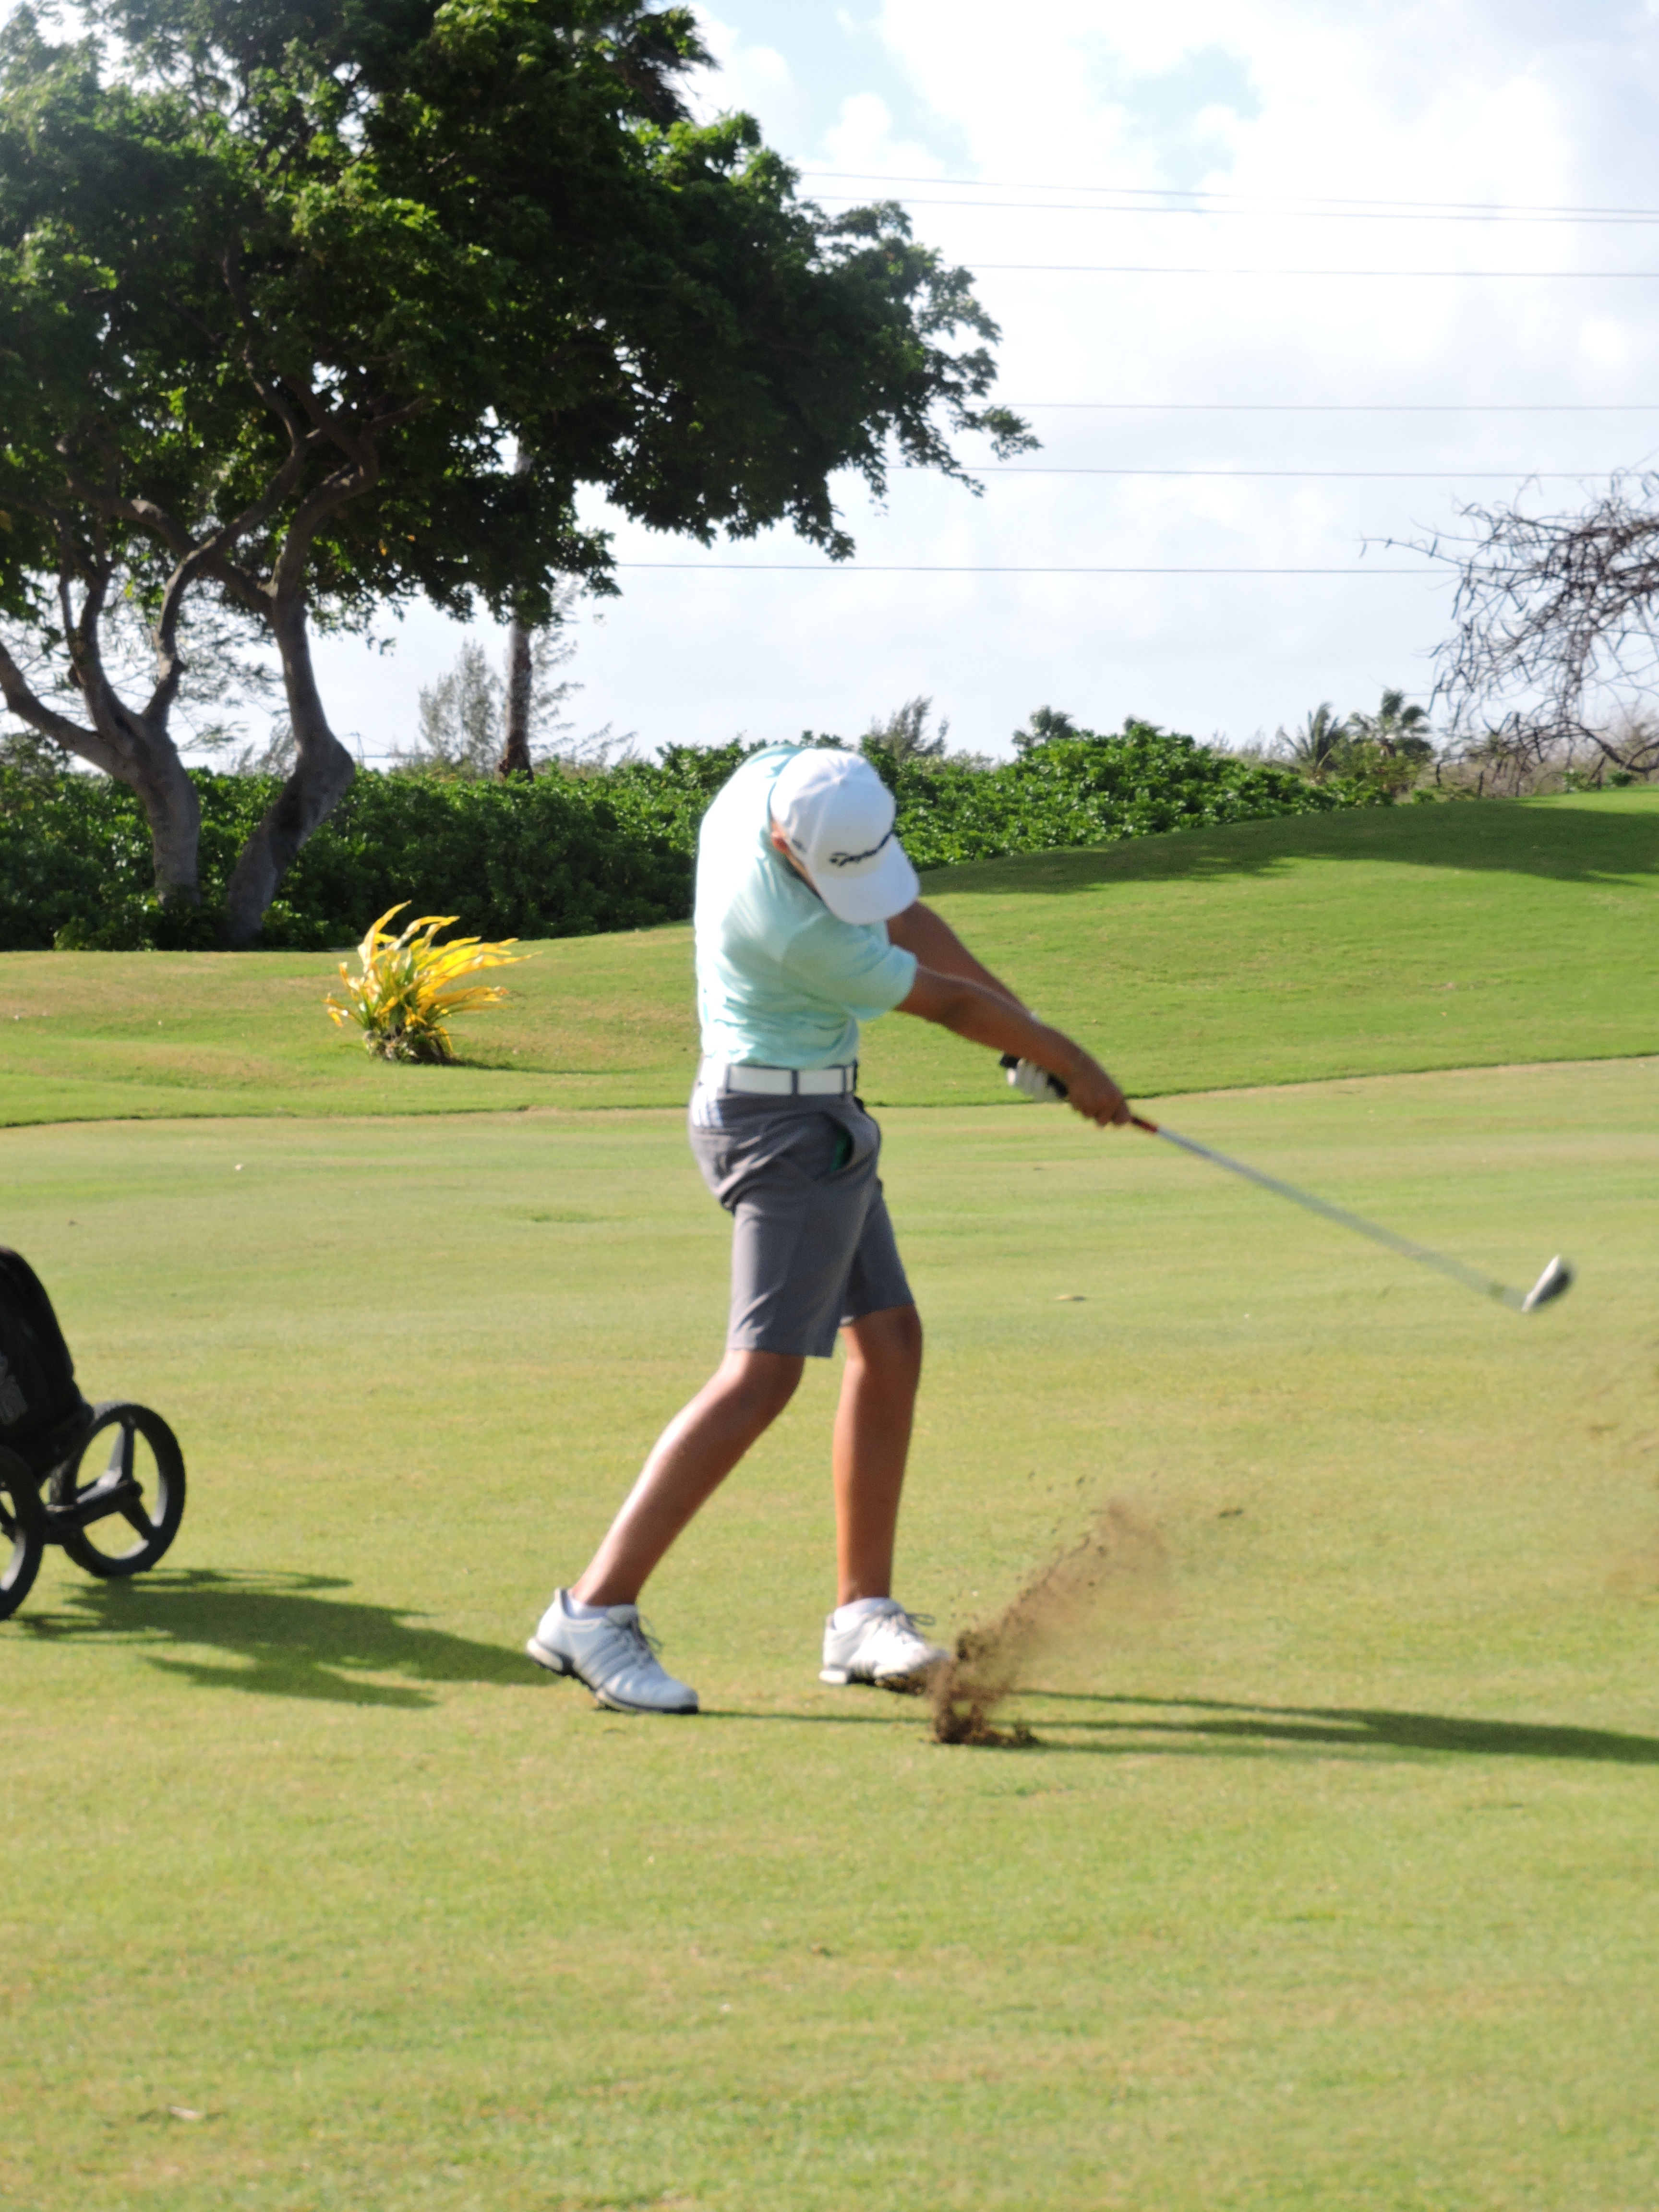 Aaron Jarvis - 3rd hole